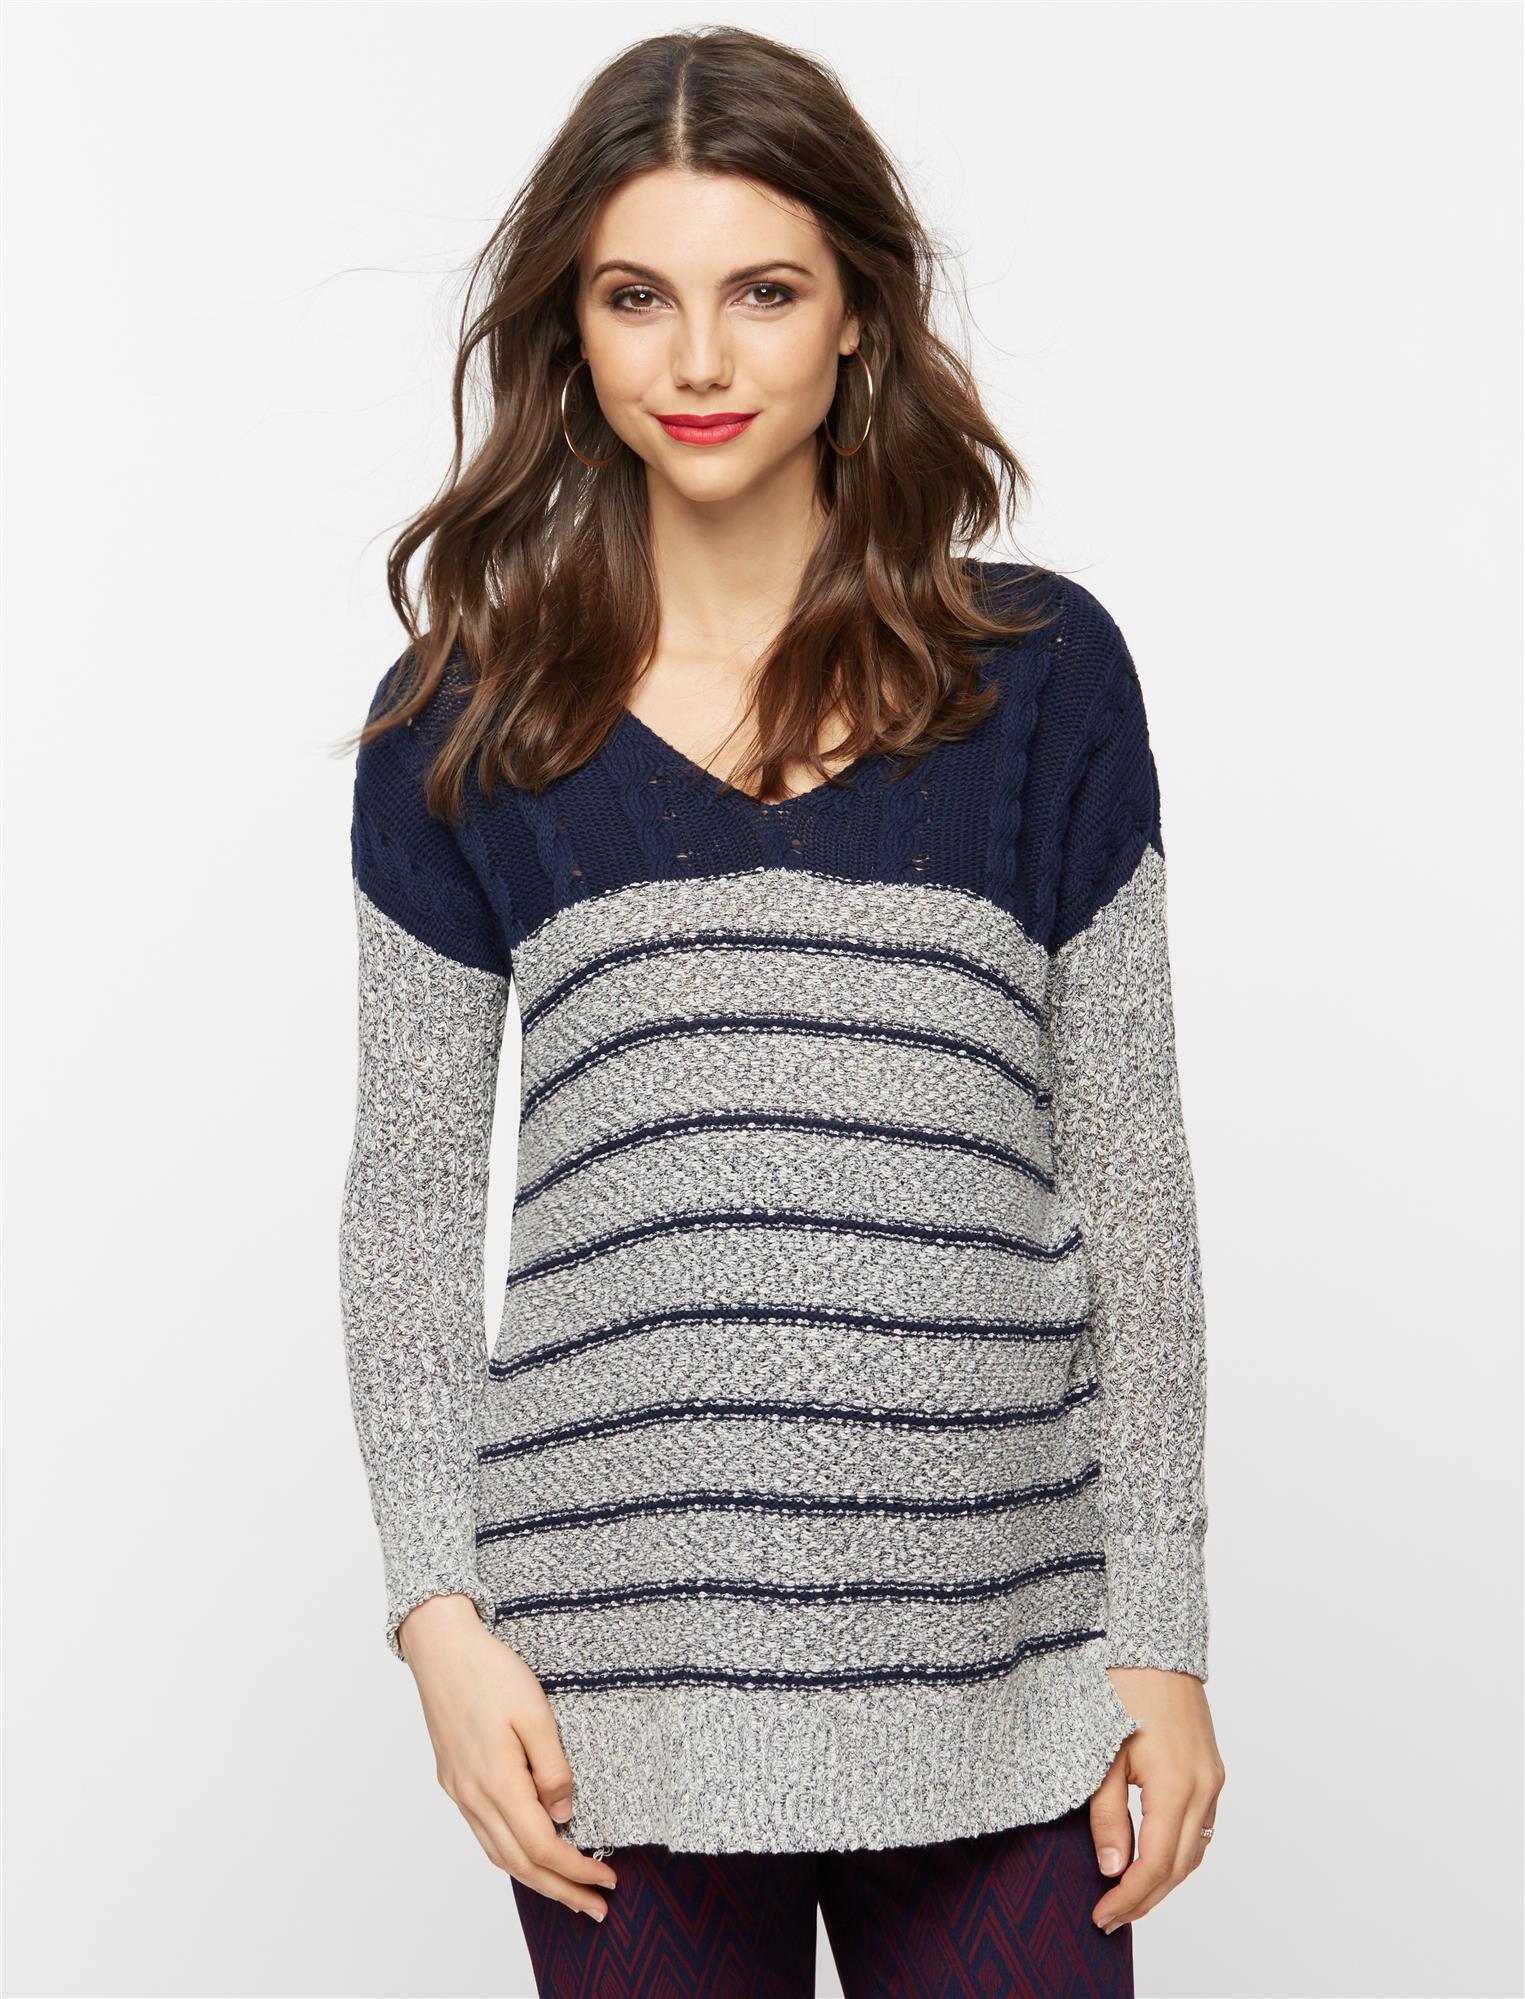 Mixed Stich Maternity Sweater